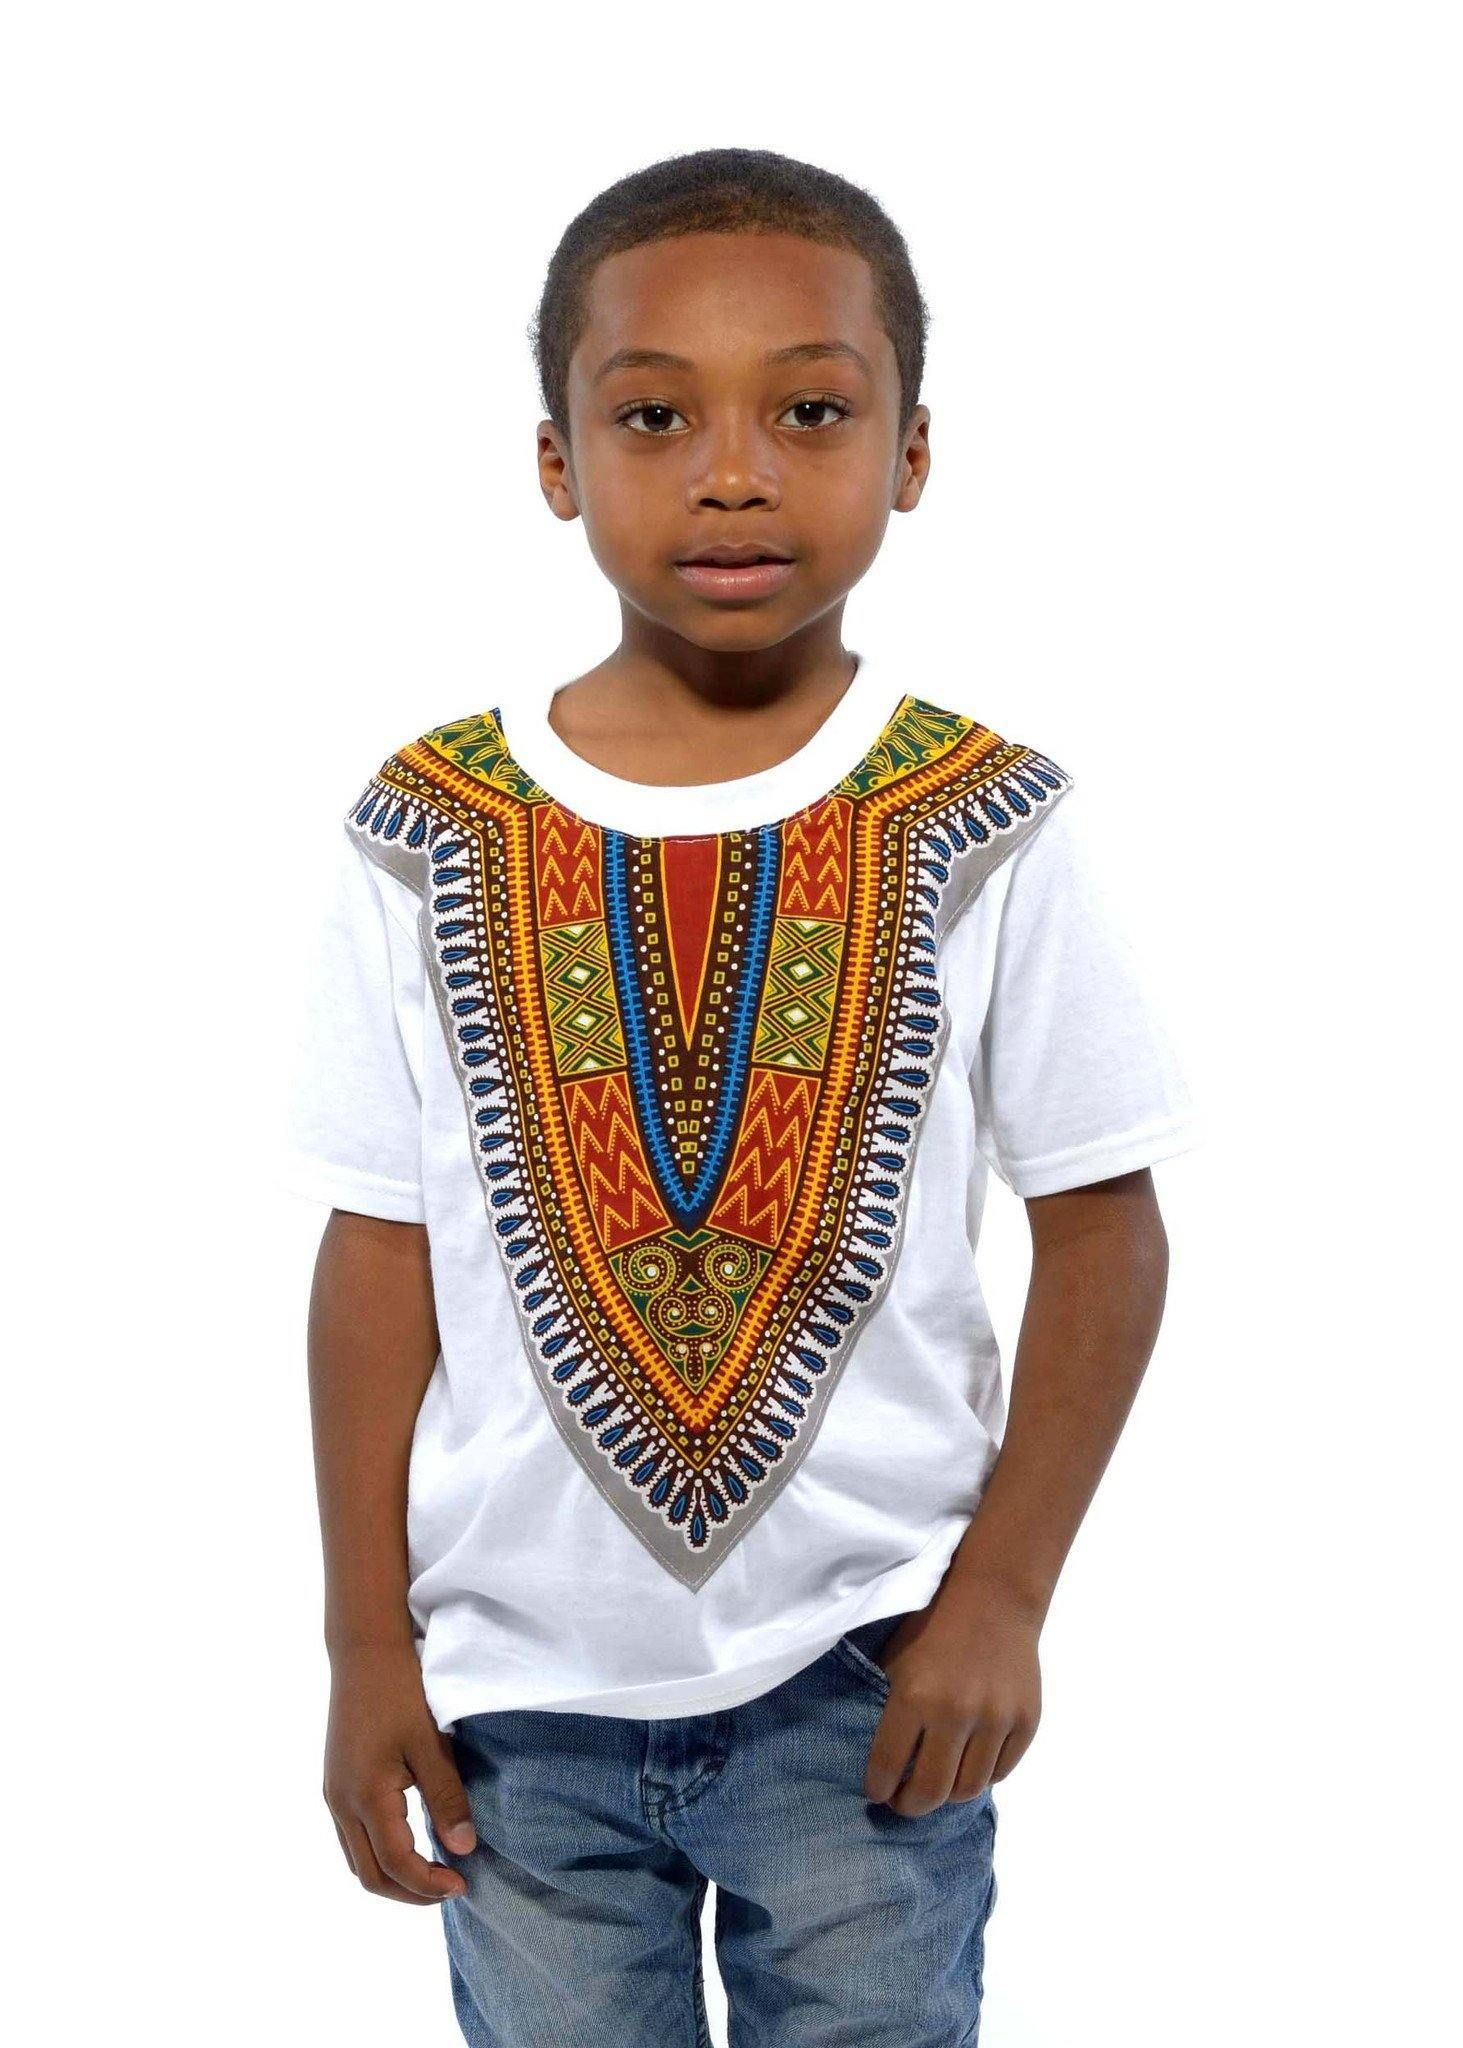 077917c4690 Kid s African Print Dashiki T-Shirt (White)